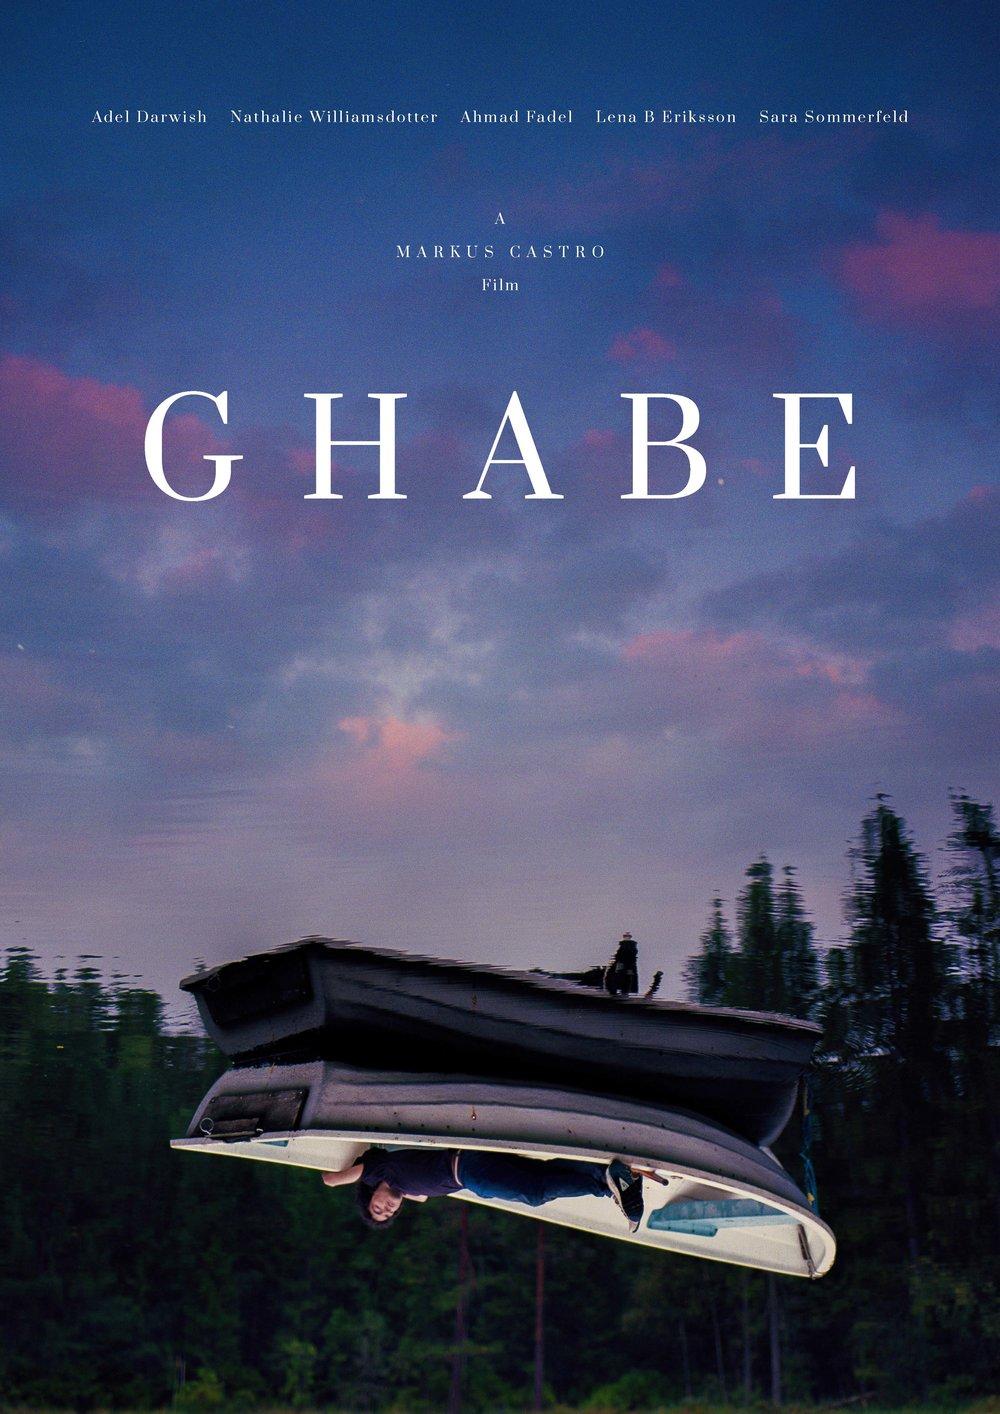 GHABE poster 1.jpg